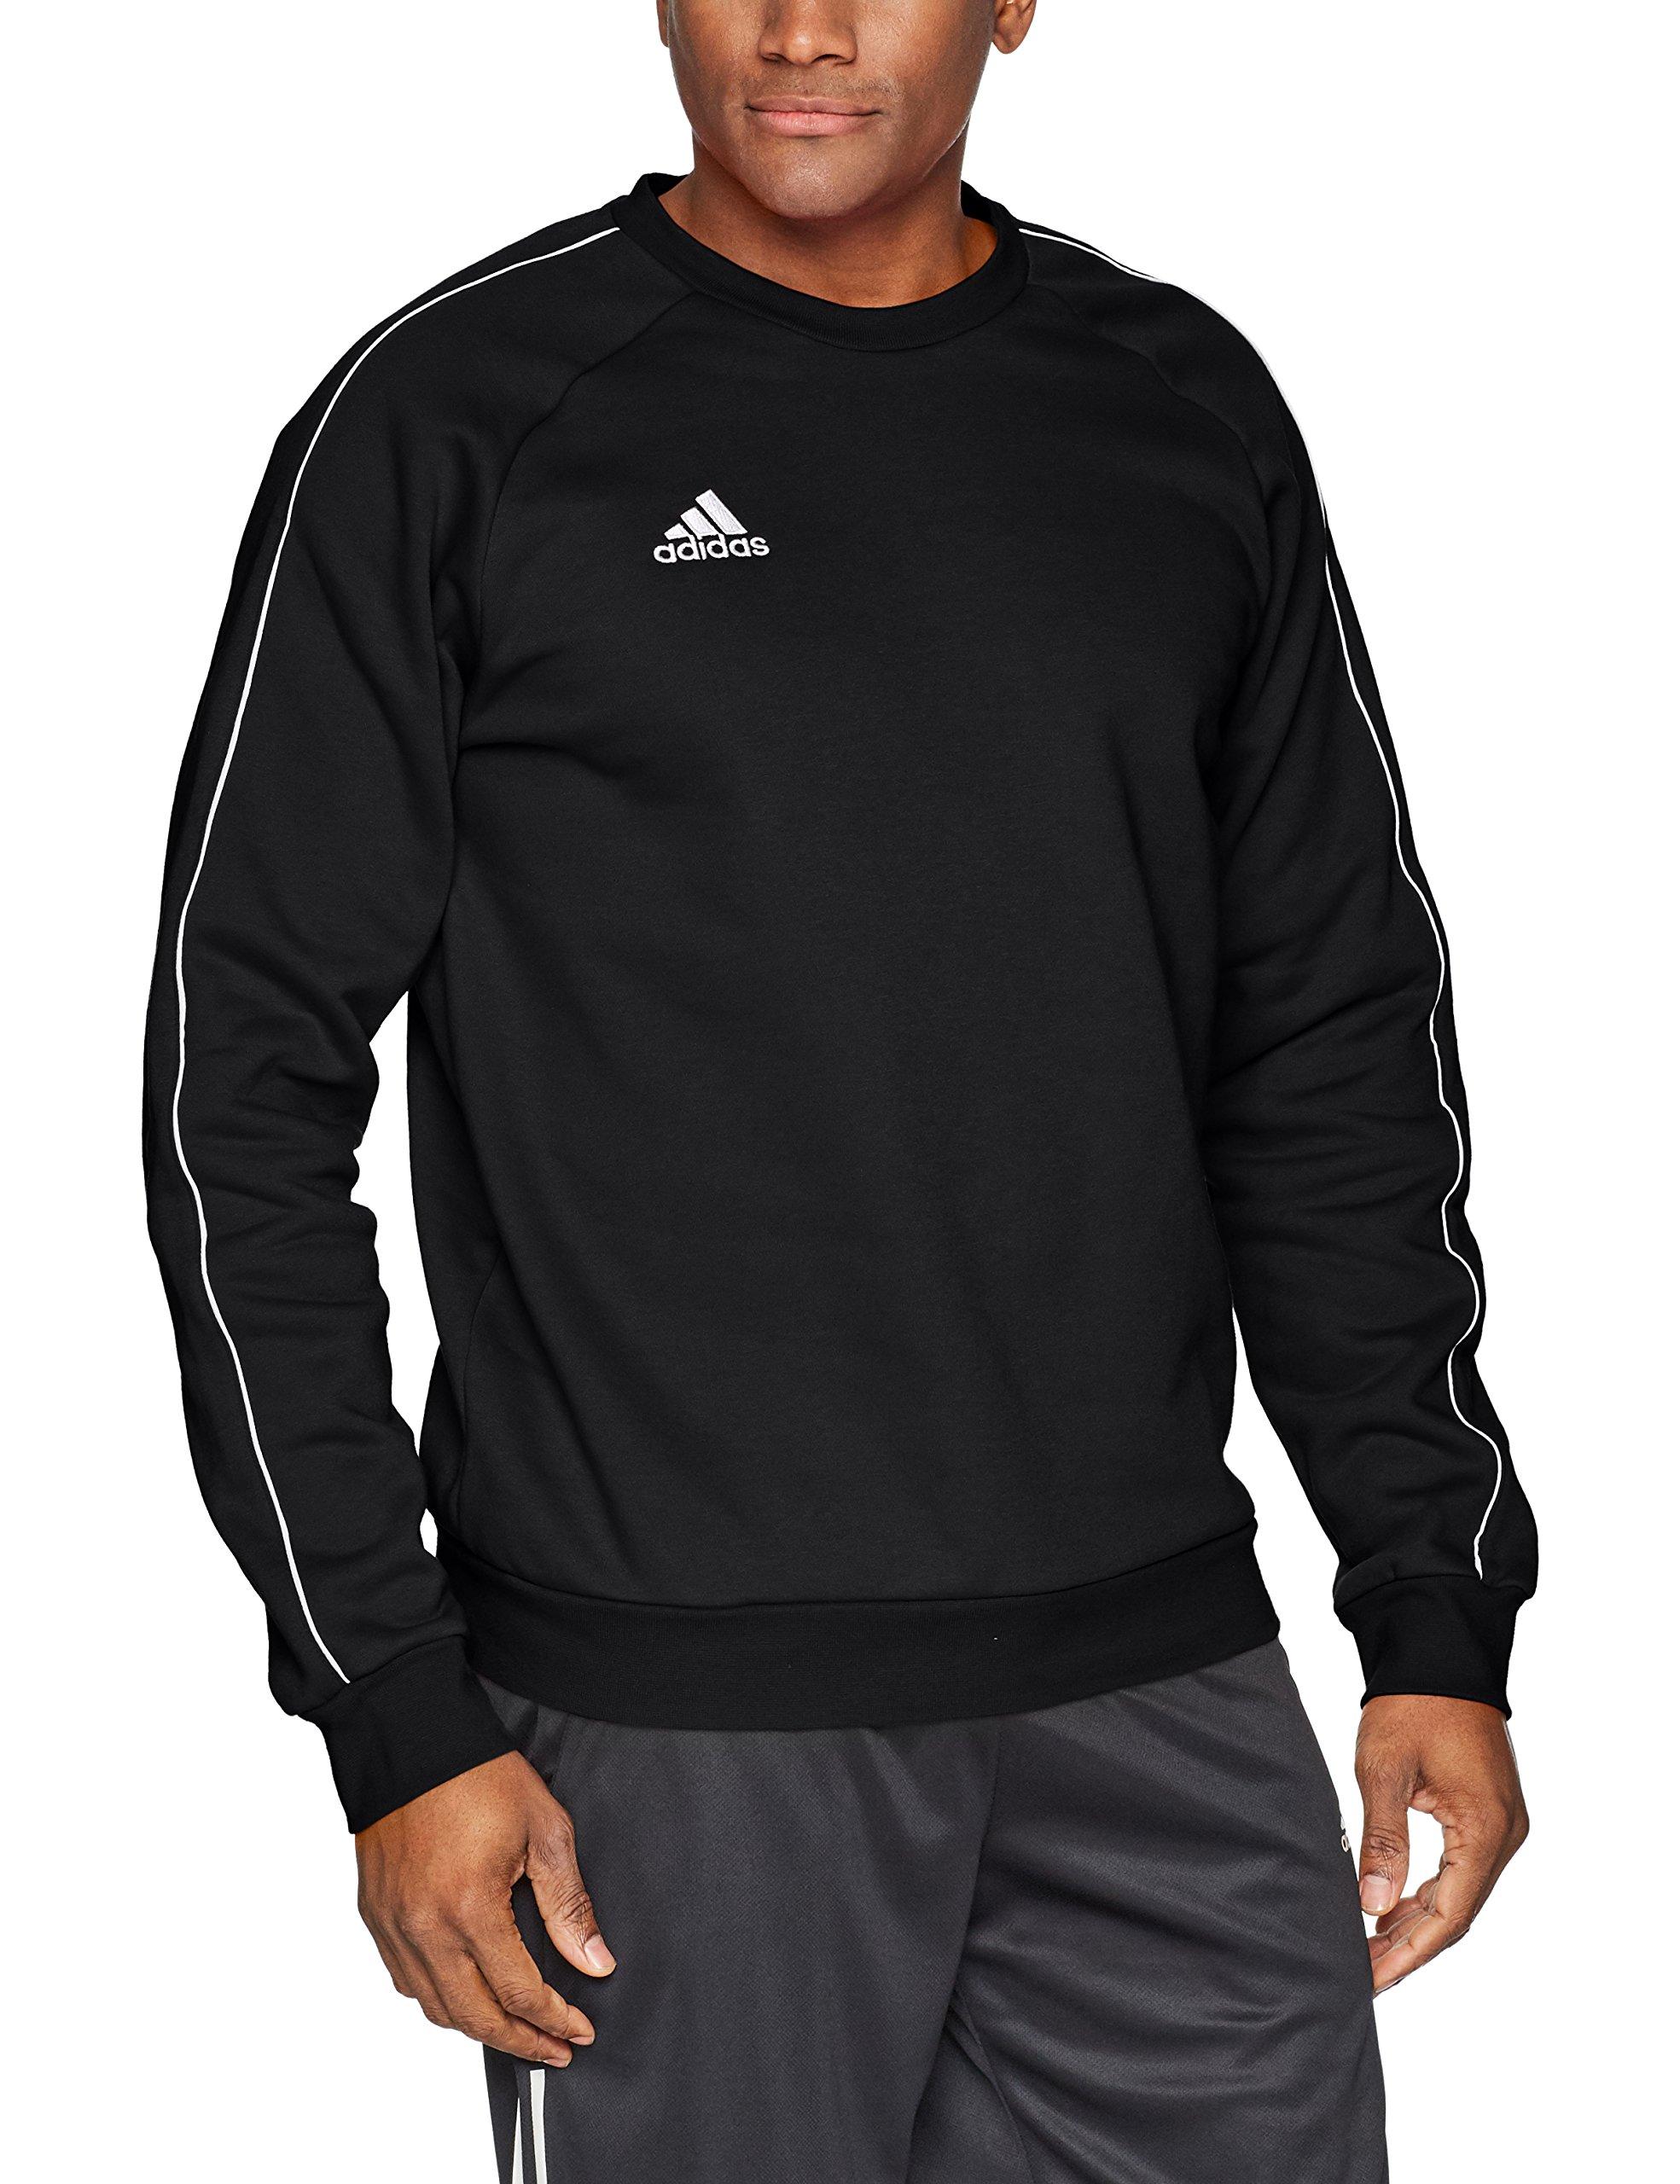 adidas Men's Core 18 Soccer Sweatshirt, Black/White, X-Small